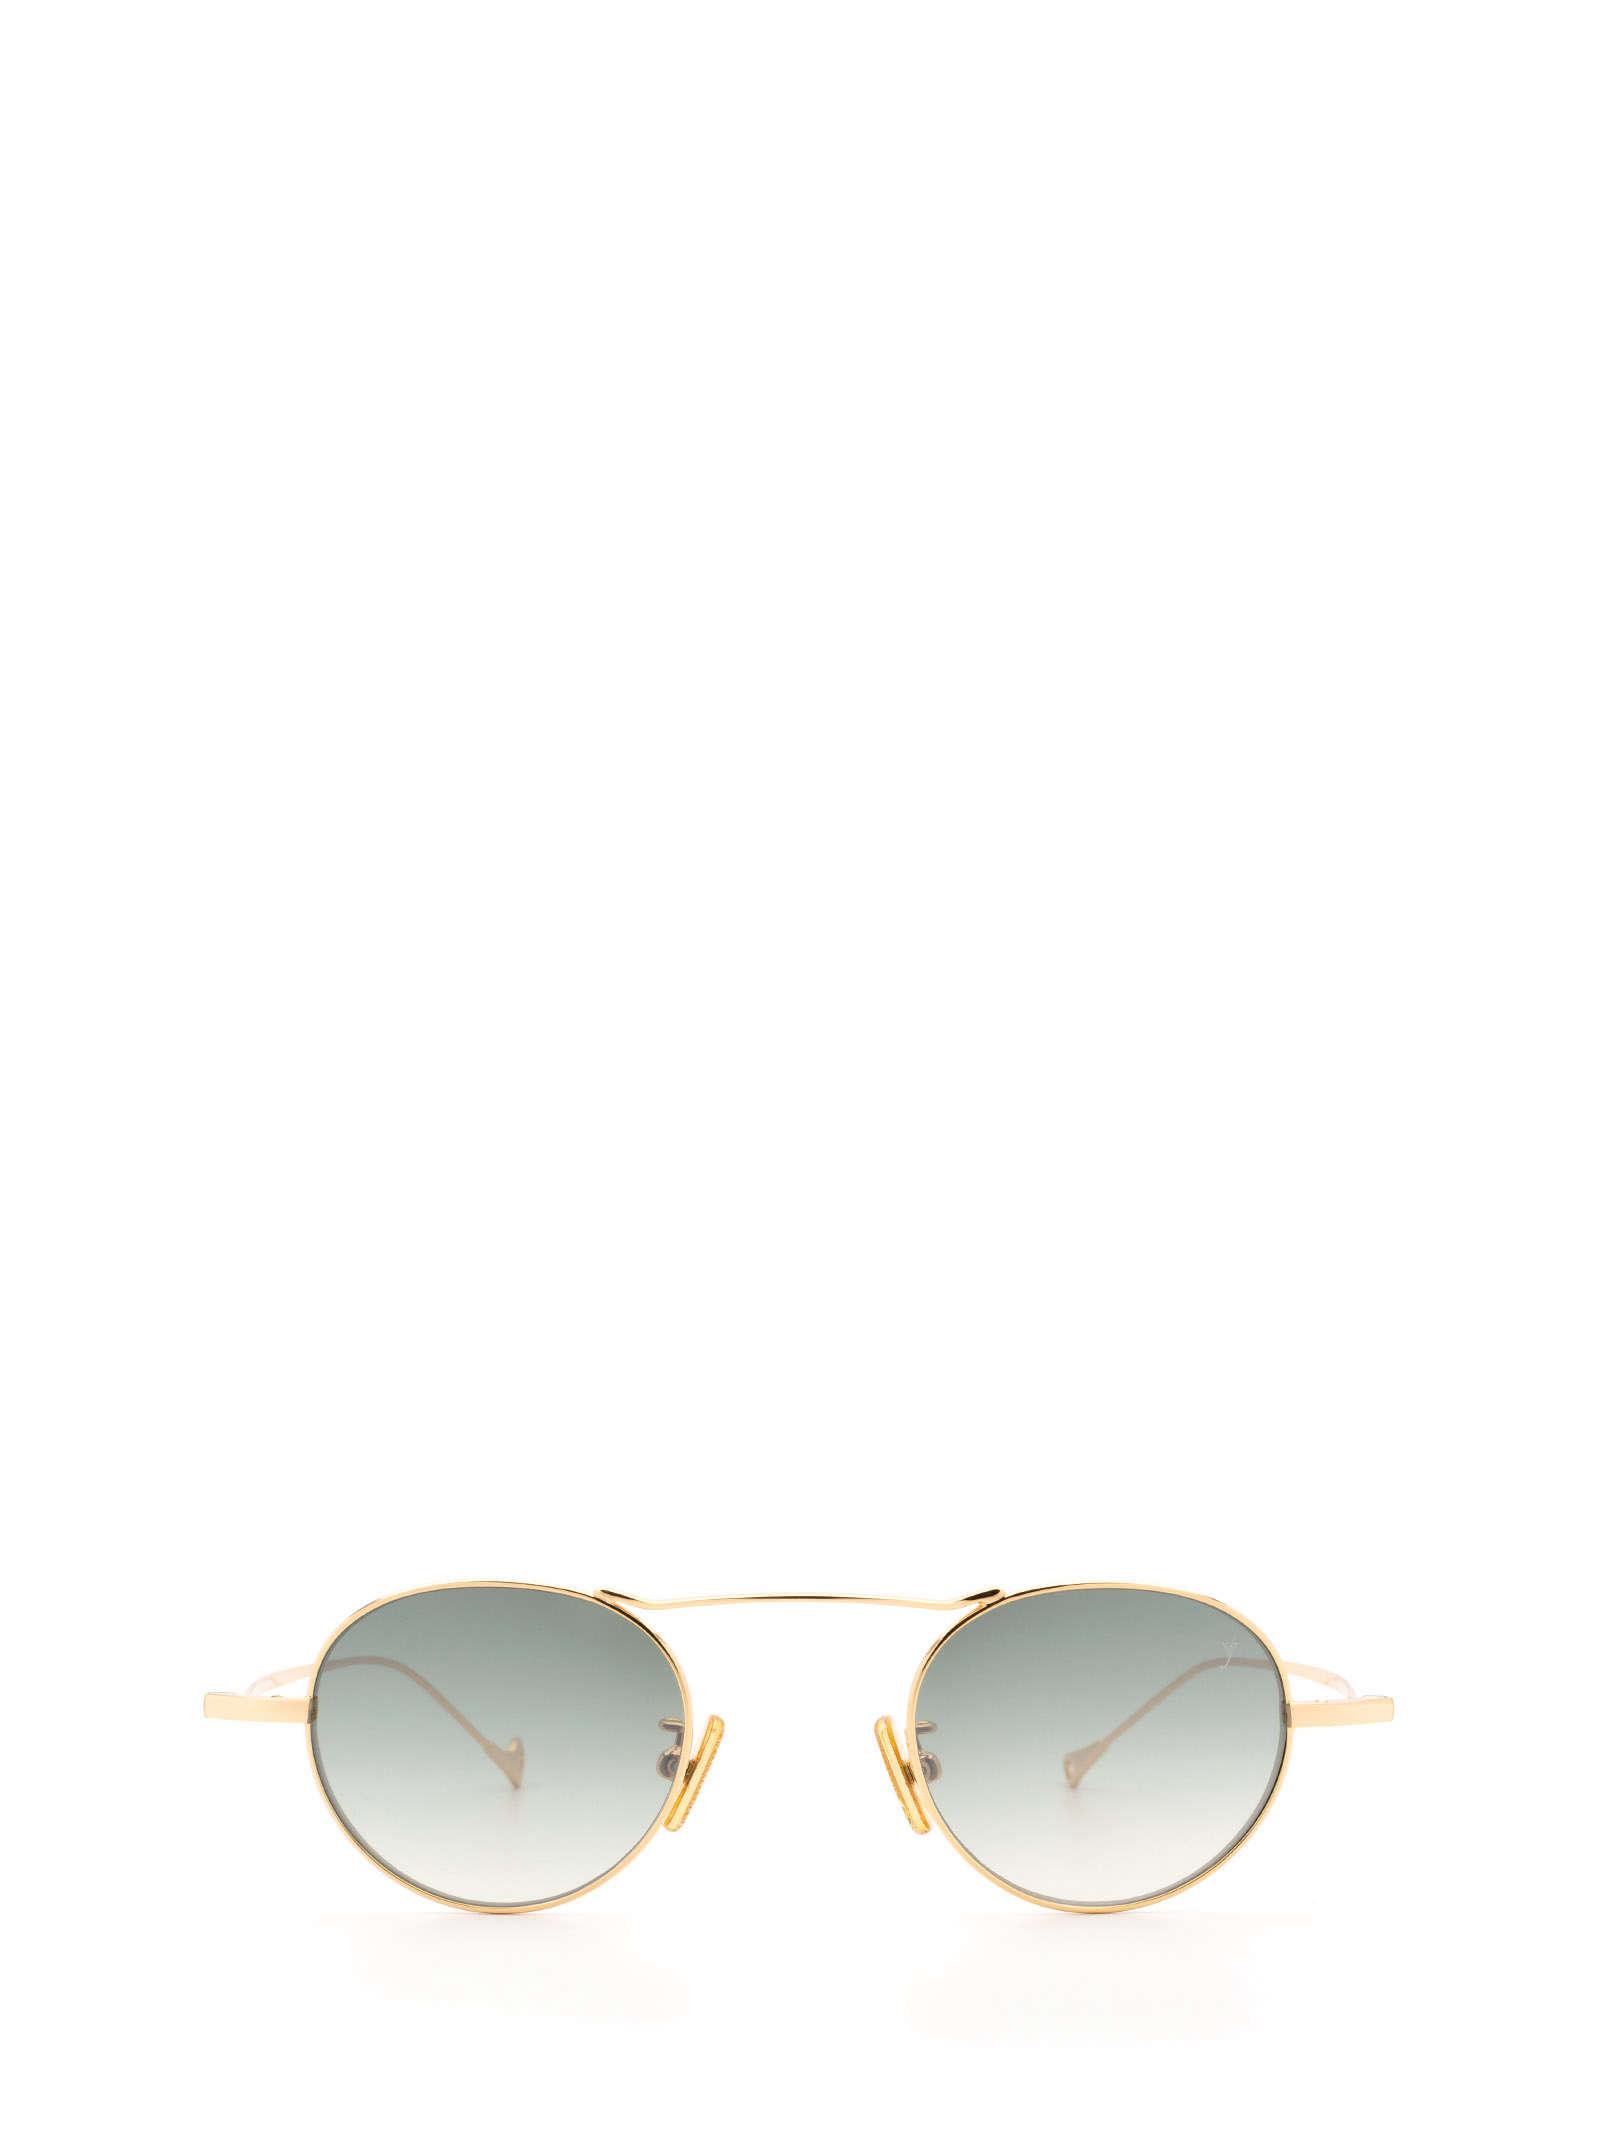 Eyepetizer Eyepetizer Yves C.4-25f Sunglasses